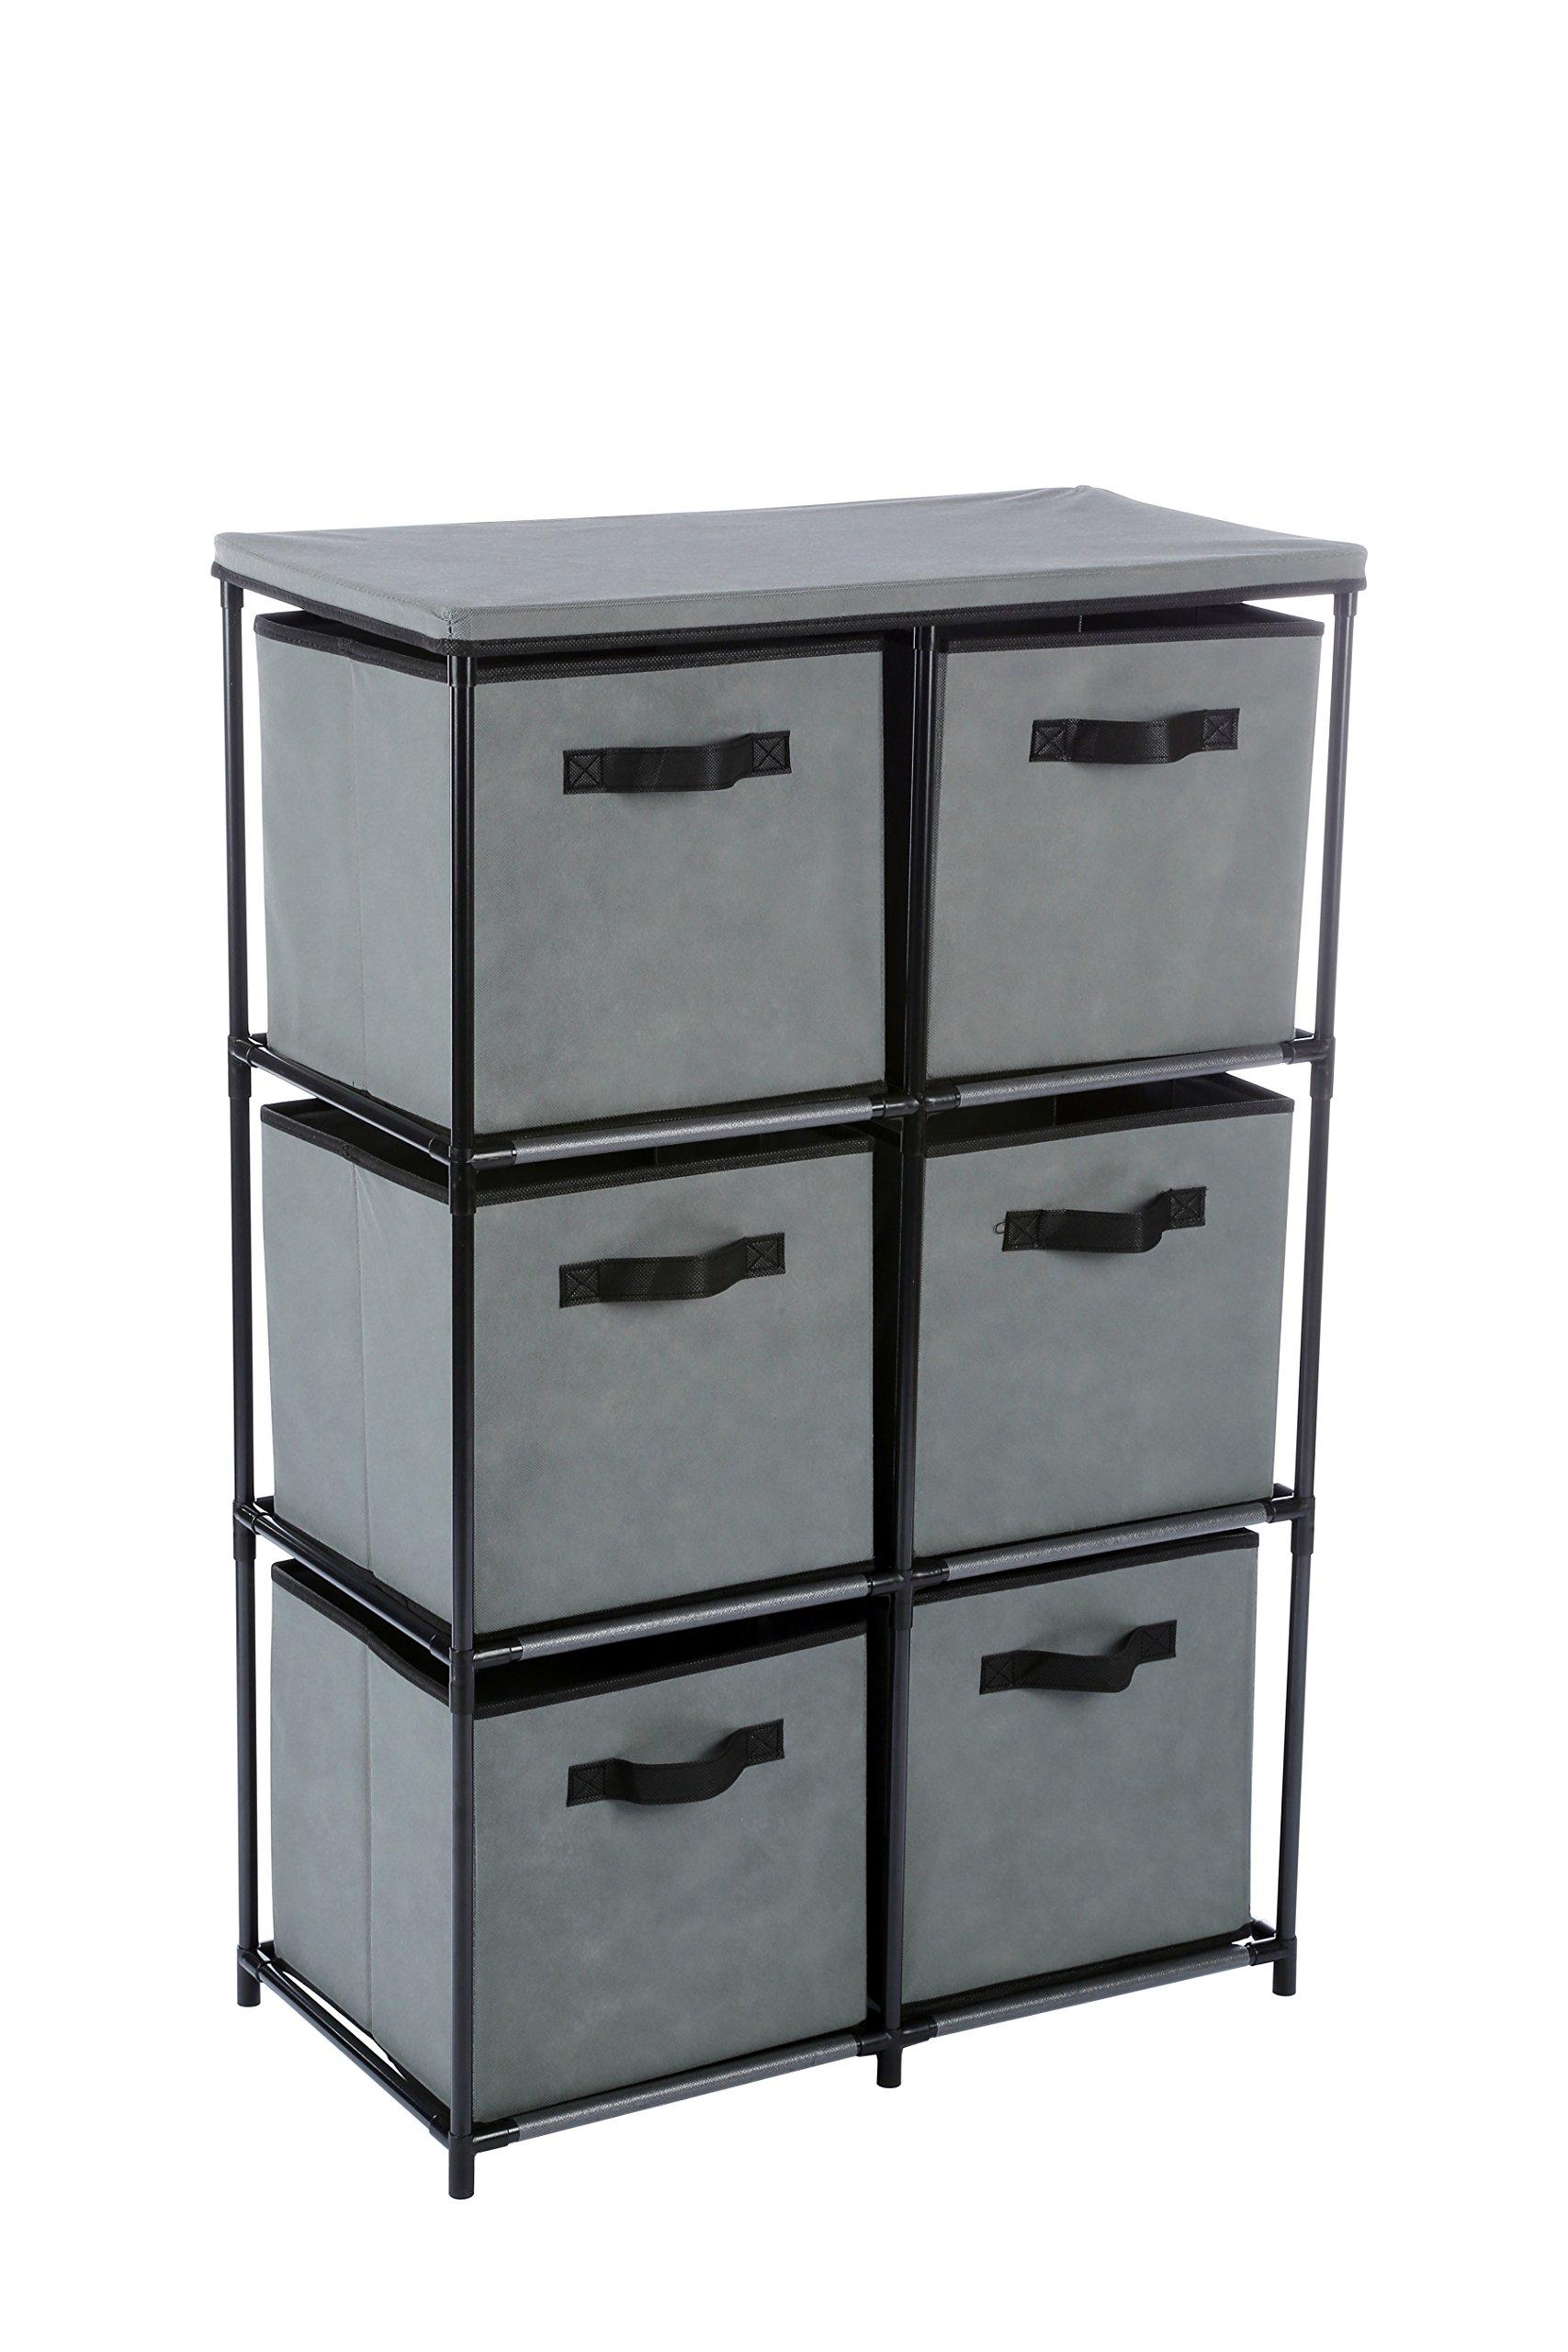 Homebi 6-Drawer Storage Chest Shelf Unit Storage Cabinet Multi-Bin Organizer with Removable Non-woven Fabric Bins in Grey,25''W x 13.2''D x38.0''H